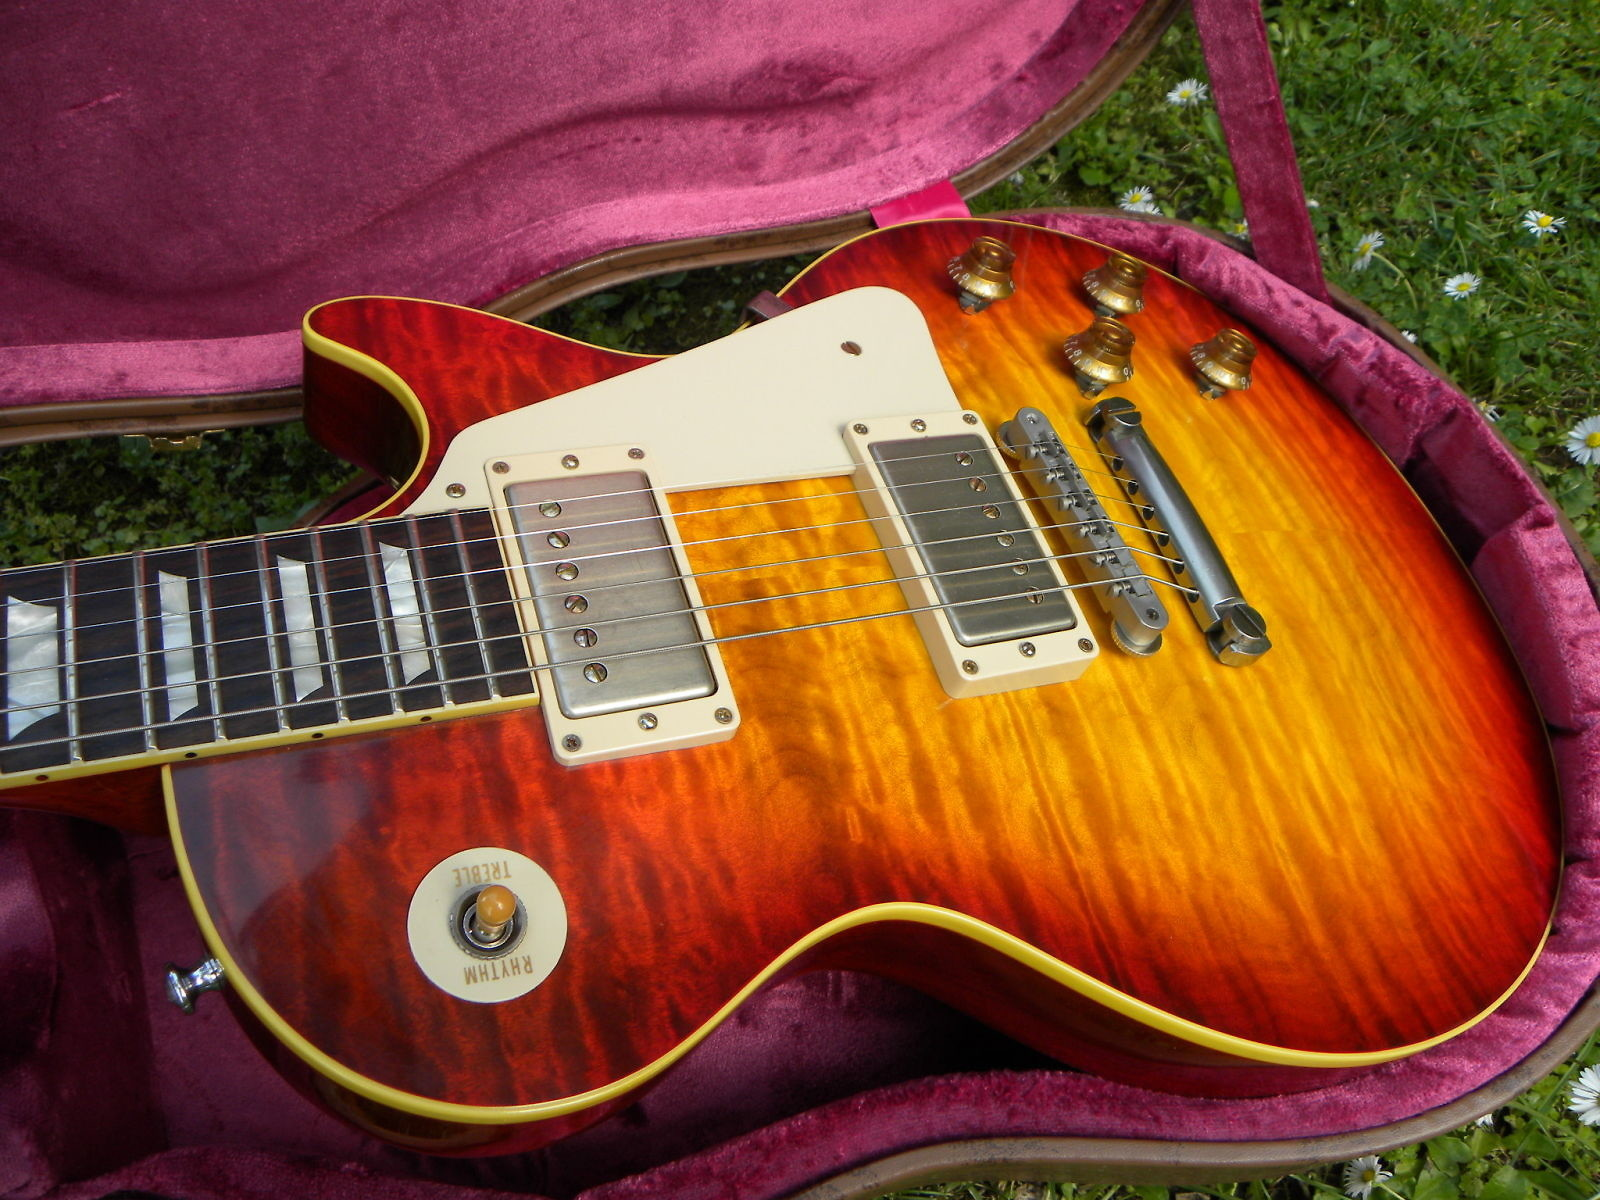 gibson les paul 1959 20th anniversary aaaaa top murphy burst 2013 murphy burst guitar for sale. Black Bedroom Furniture Sets. Home Design Ideas